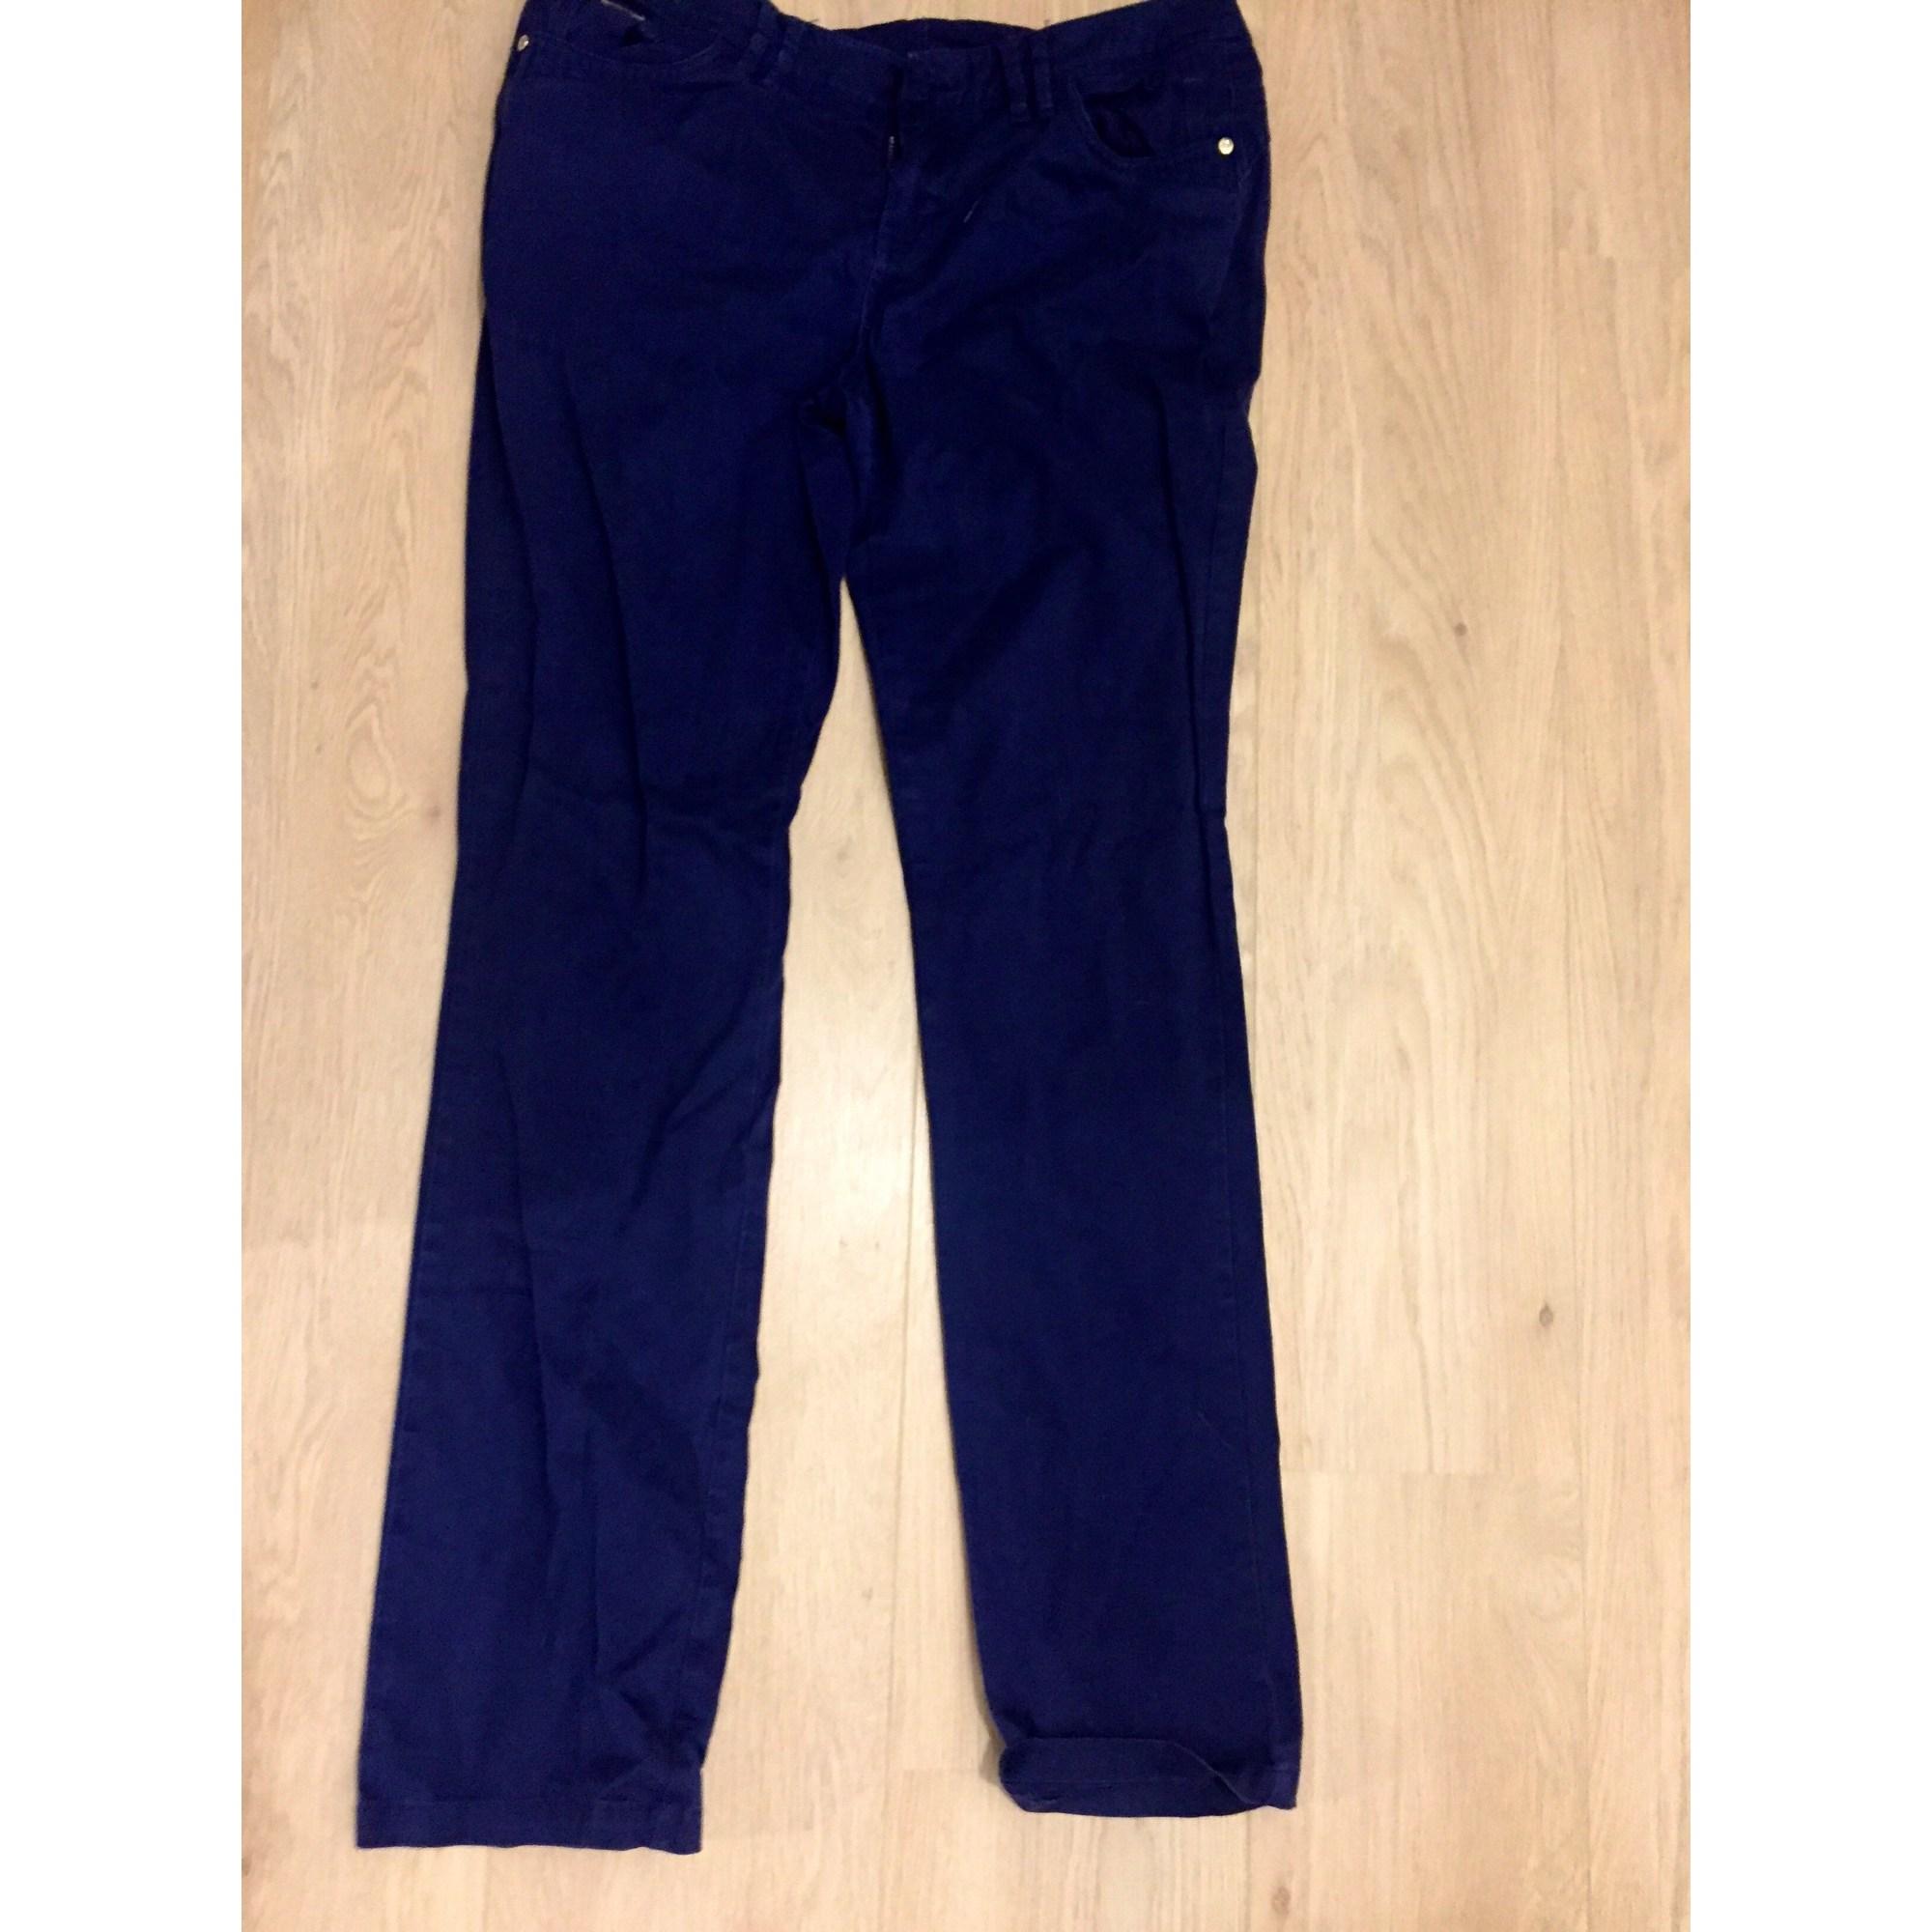 Pantalon droit MORGAN Bleu, bleu marine, bleu turquoise